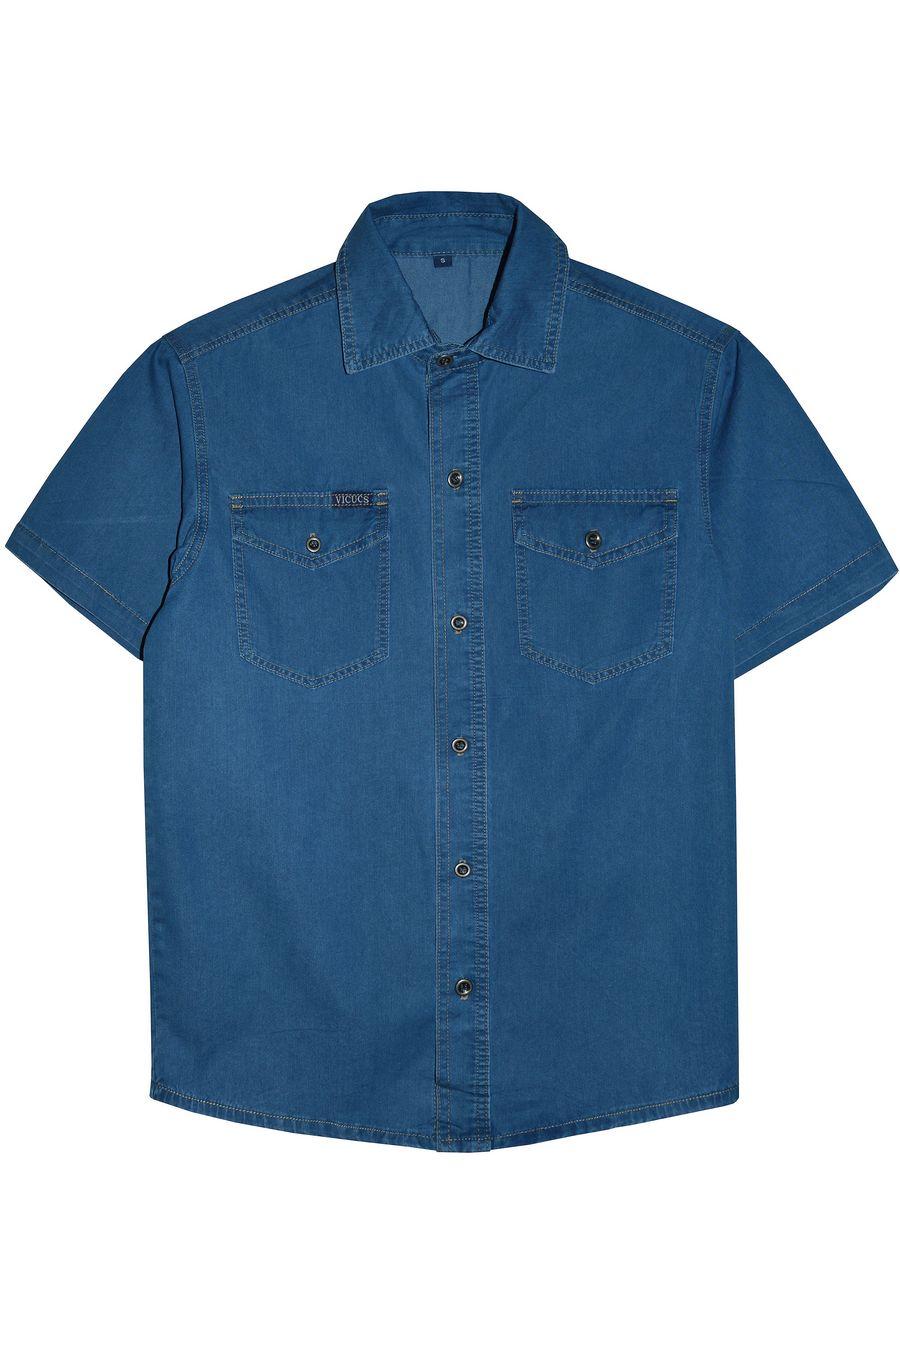 Рубашка мужская Vicucs 728E/CT-321-19 (XL-5XL) - фото 1